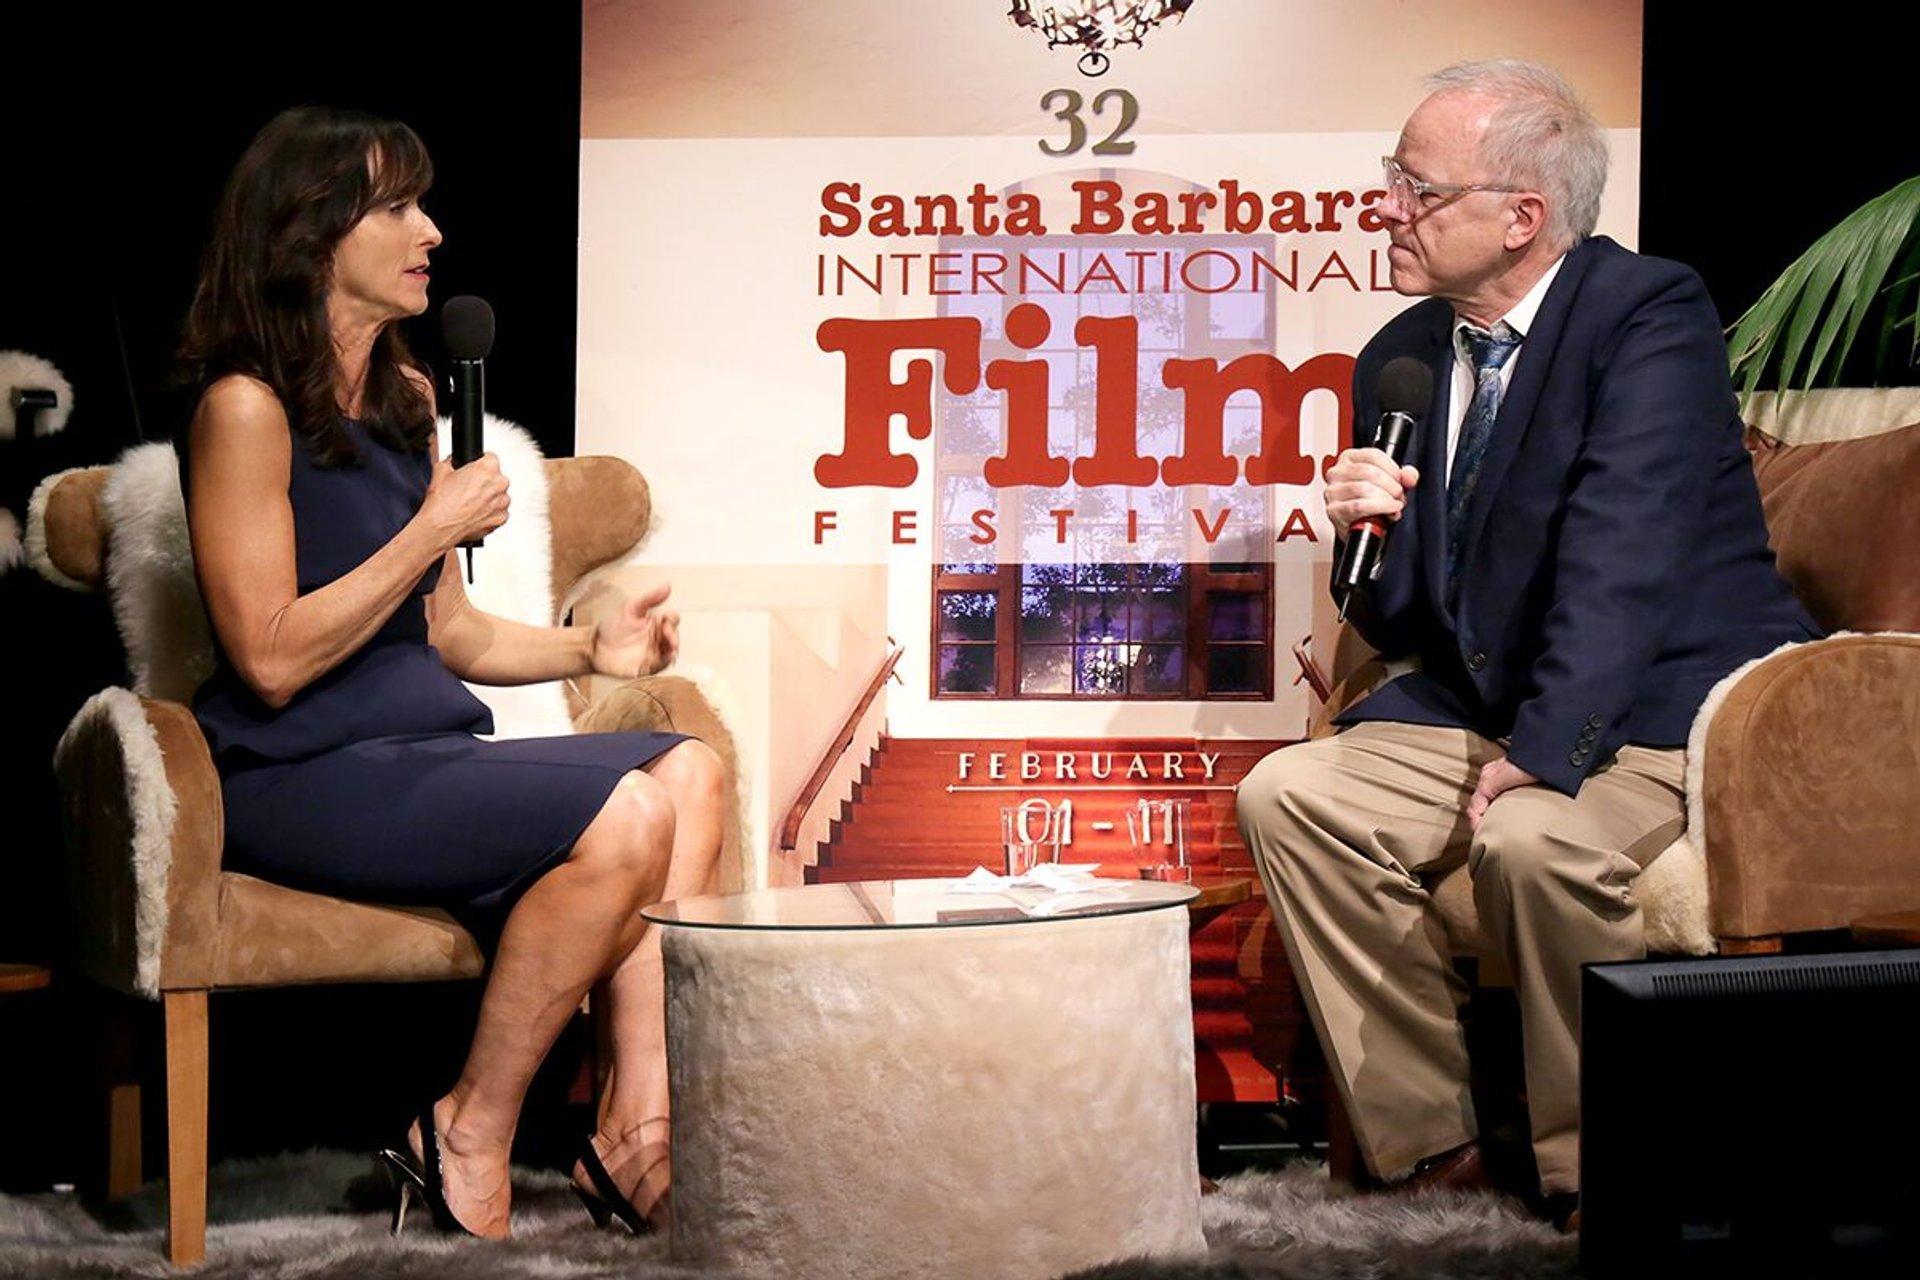 Santa Barbara International Film Festival (SBIFF) in California - Best Season 2020